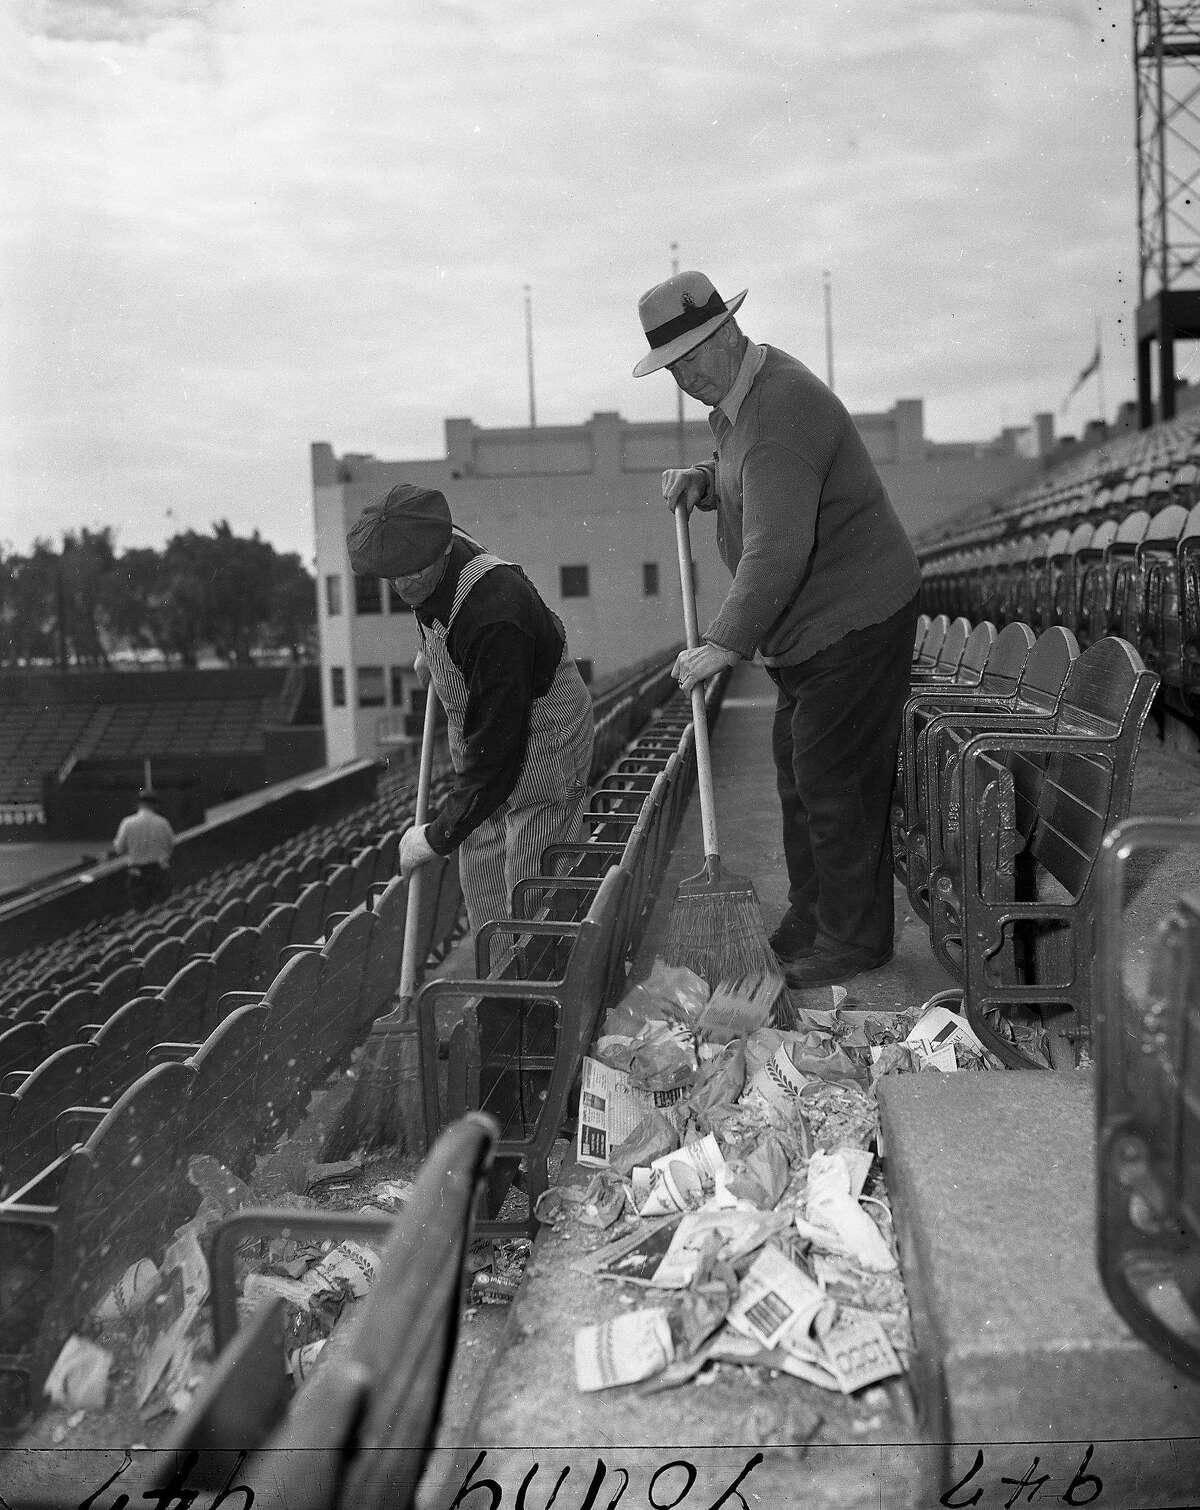 Janitors clean up peanut shells after the big peanuts giveaway at San Francisco Seals opening Day April 16, 1950 at Seals Stadium,